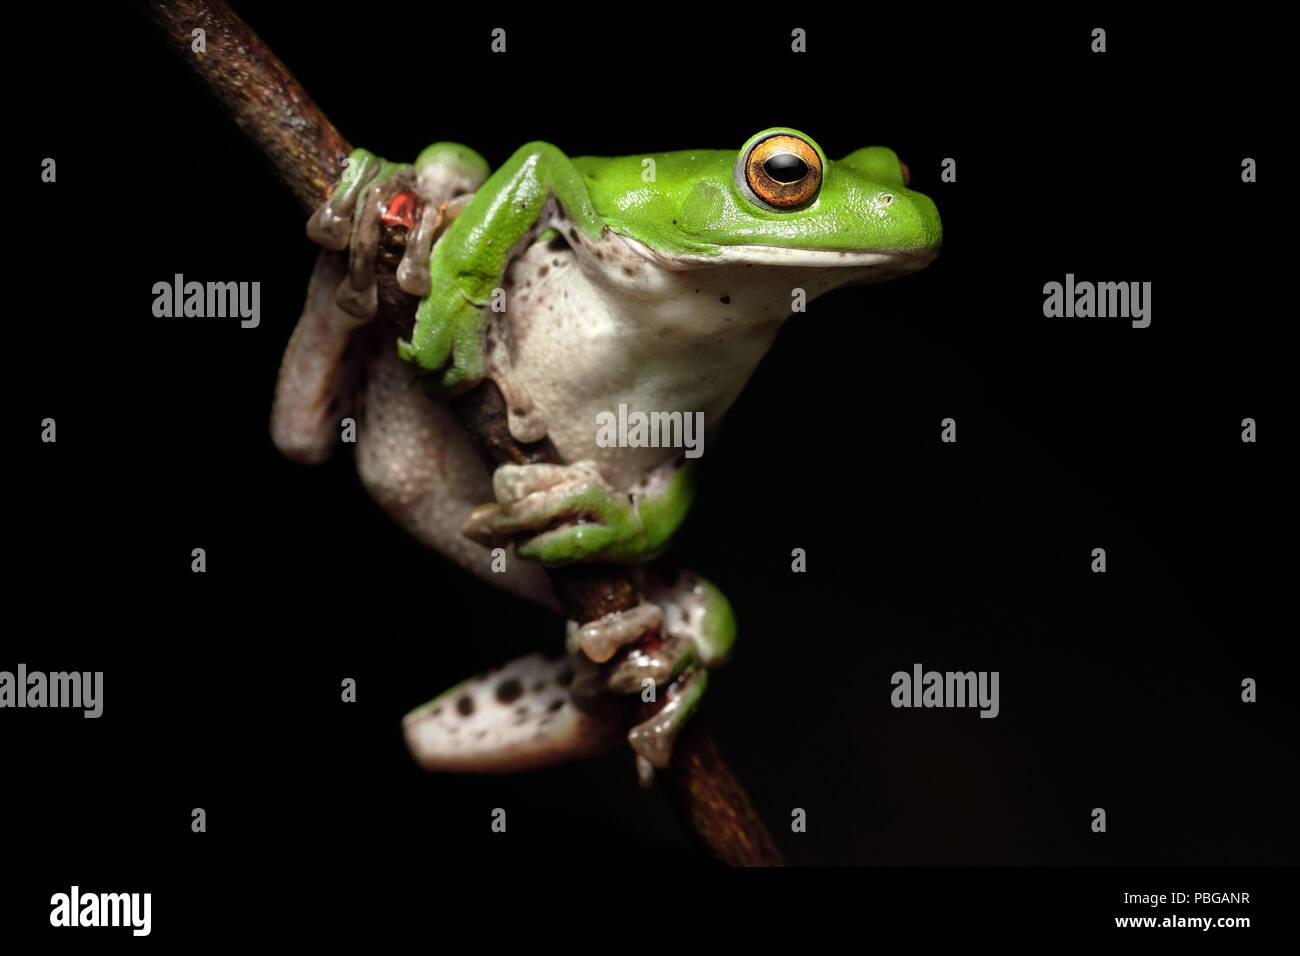 Moltrecht's Green Nantou Tree Frog Rhacophorus moltrechti - Stock Image